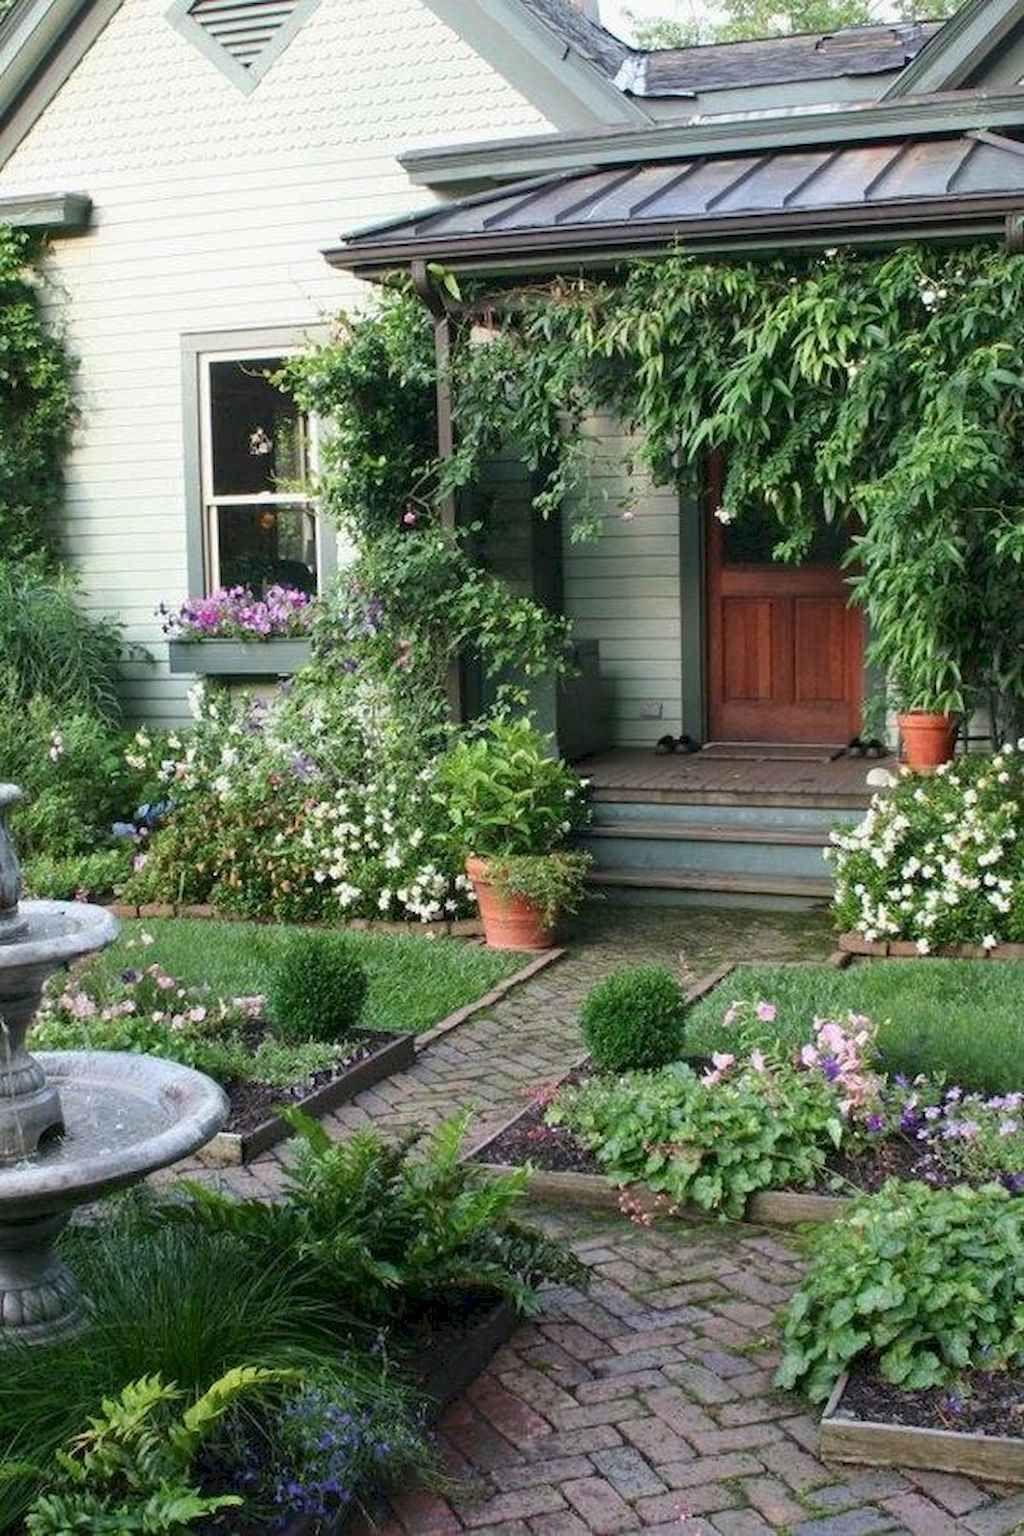 Beautiful Small Cottage Garden Ideas For Backyard Inspirations 61 Decornamentation Com Small Cottage Garden Ideas Cottage Garden Luxury Garden Backyard cottage garden ideas